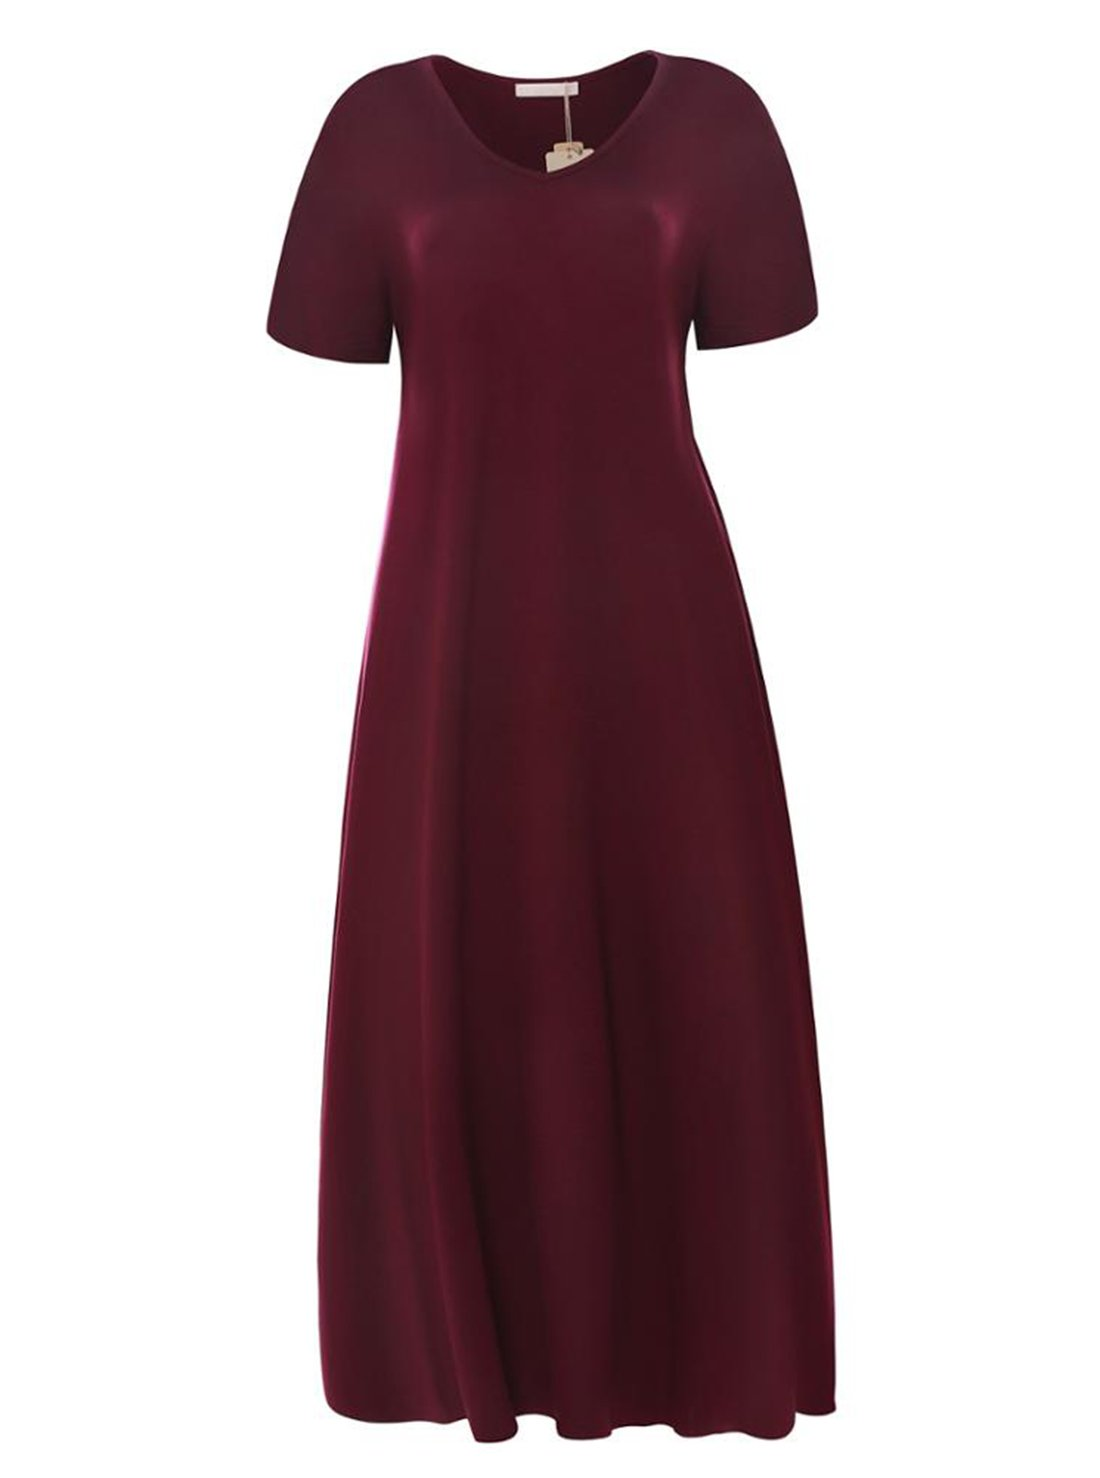 Plus Size Fancy Dresses for Maternity